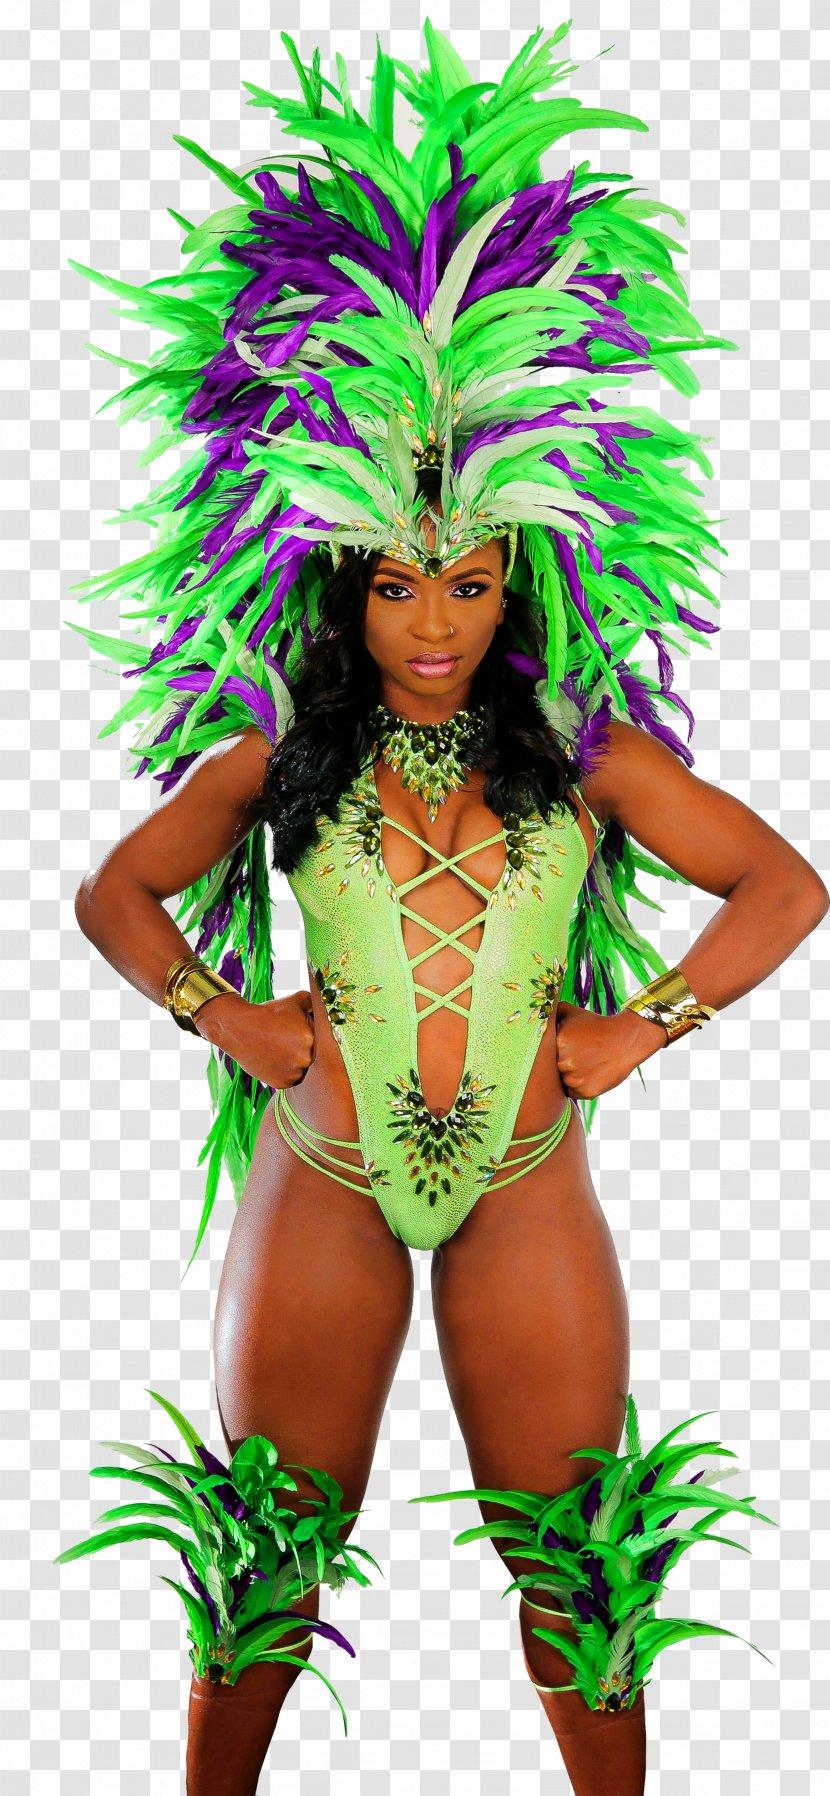 Carnival Cruise Line - Festival Transparent PNG